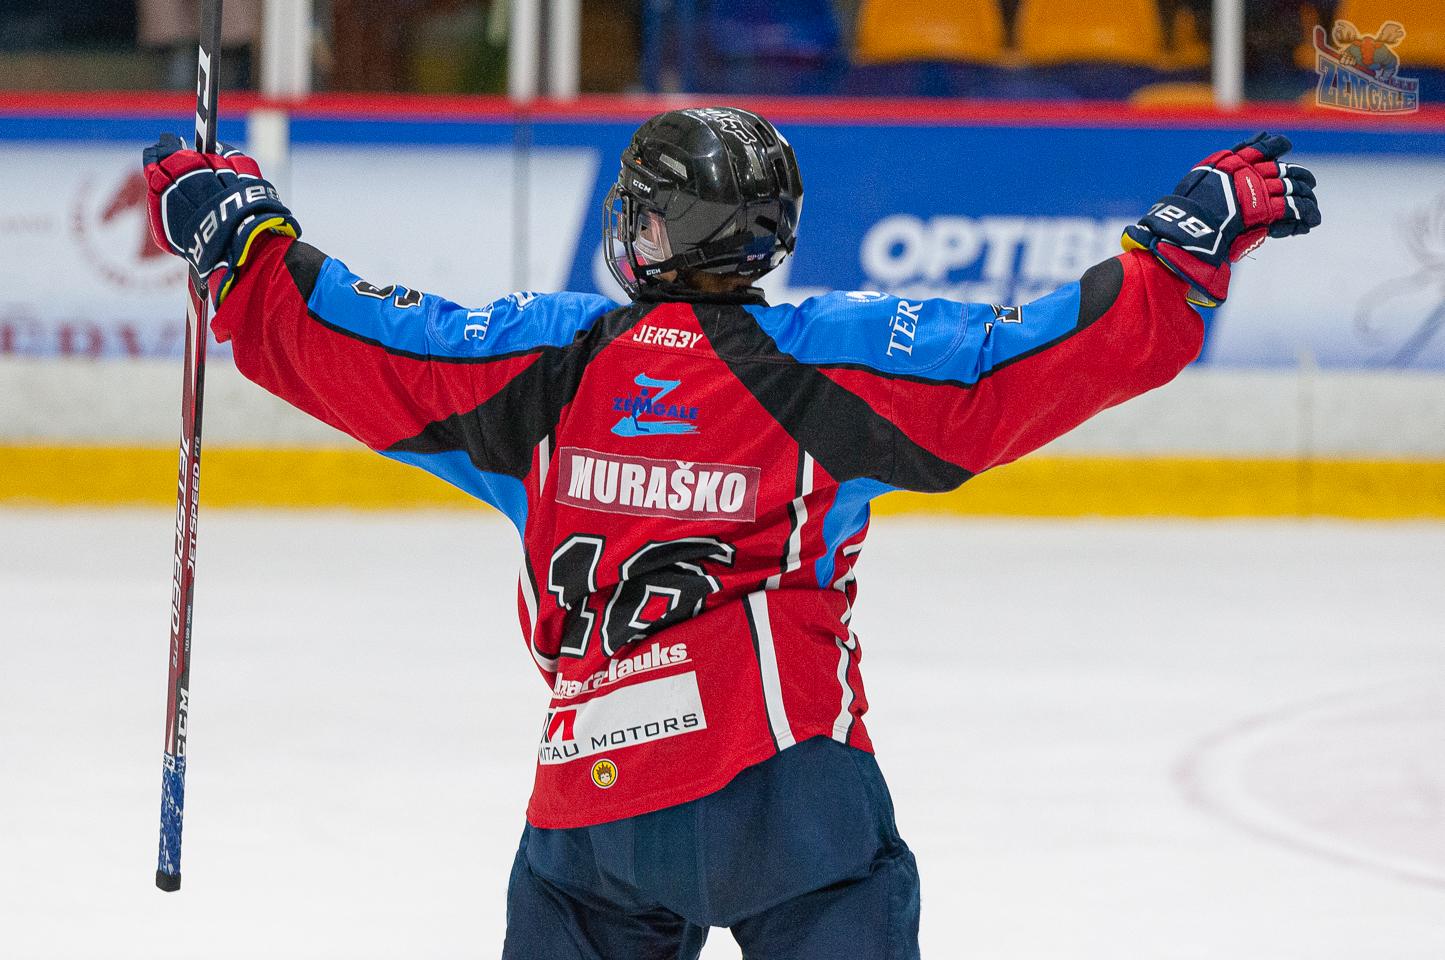 Jelgavas hokeja skola JLSS U17 - Venta 2002 14092019-06